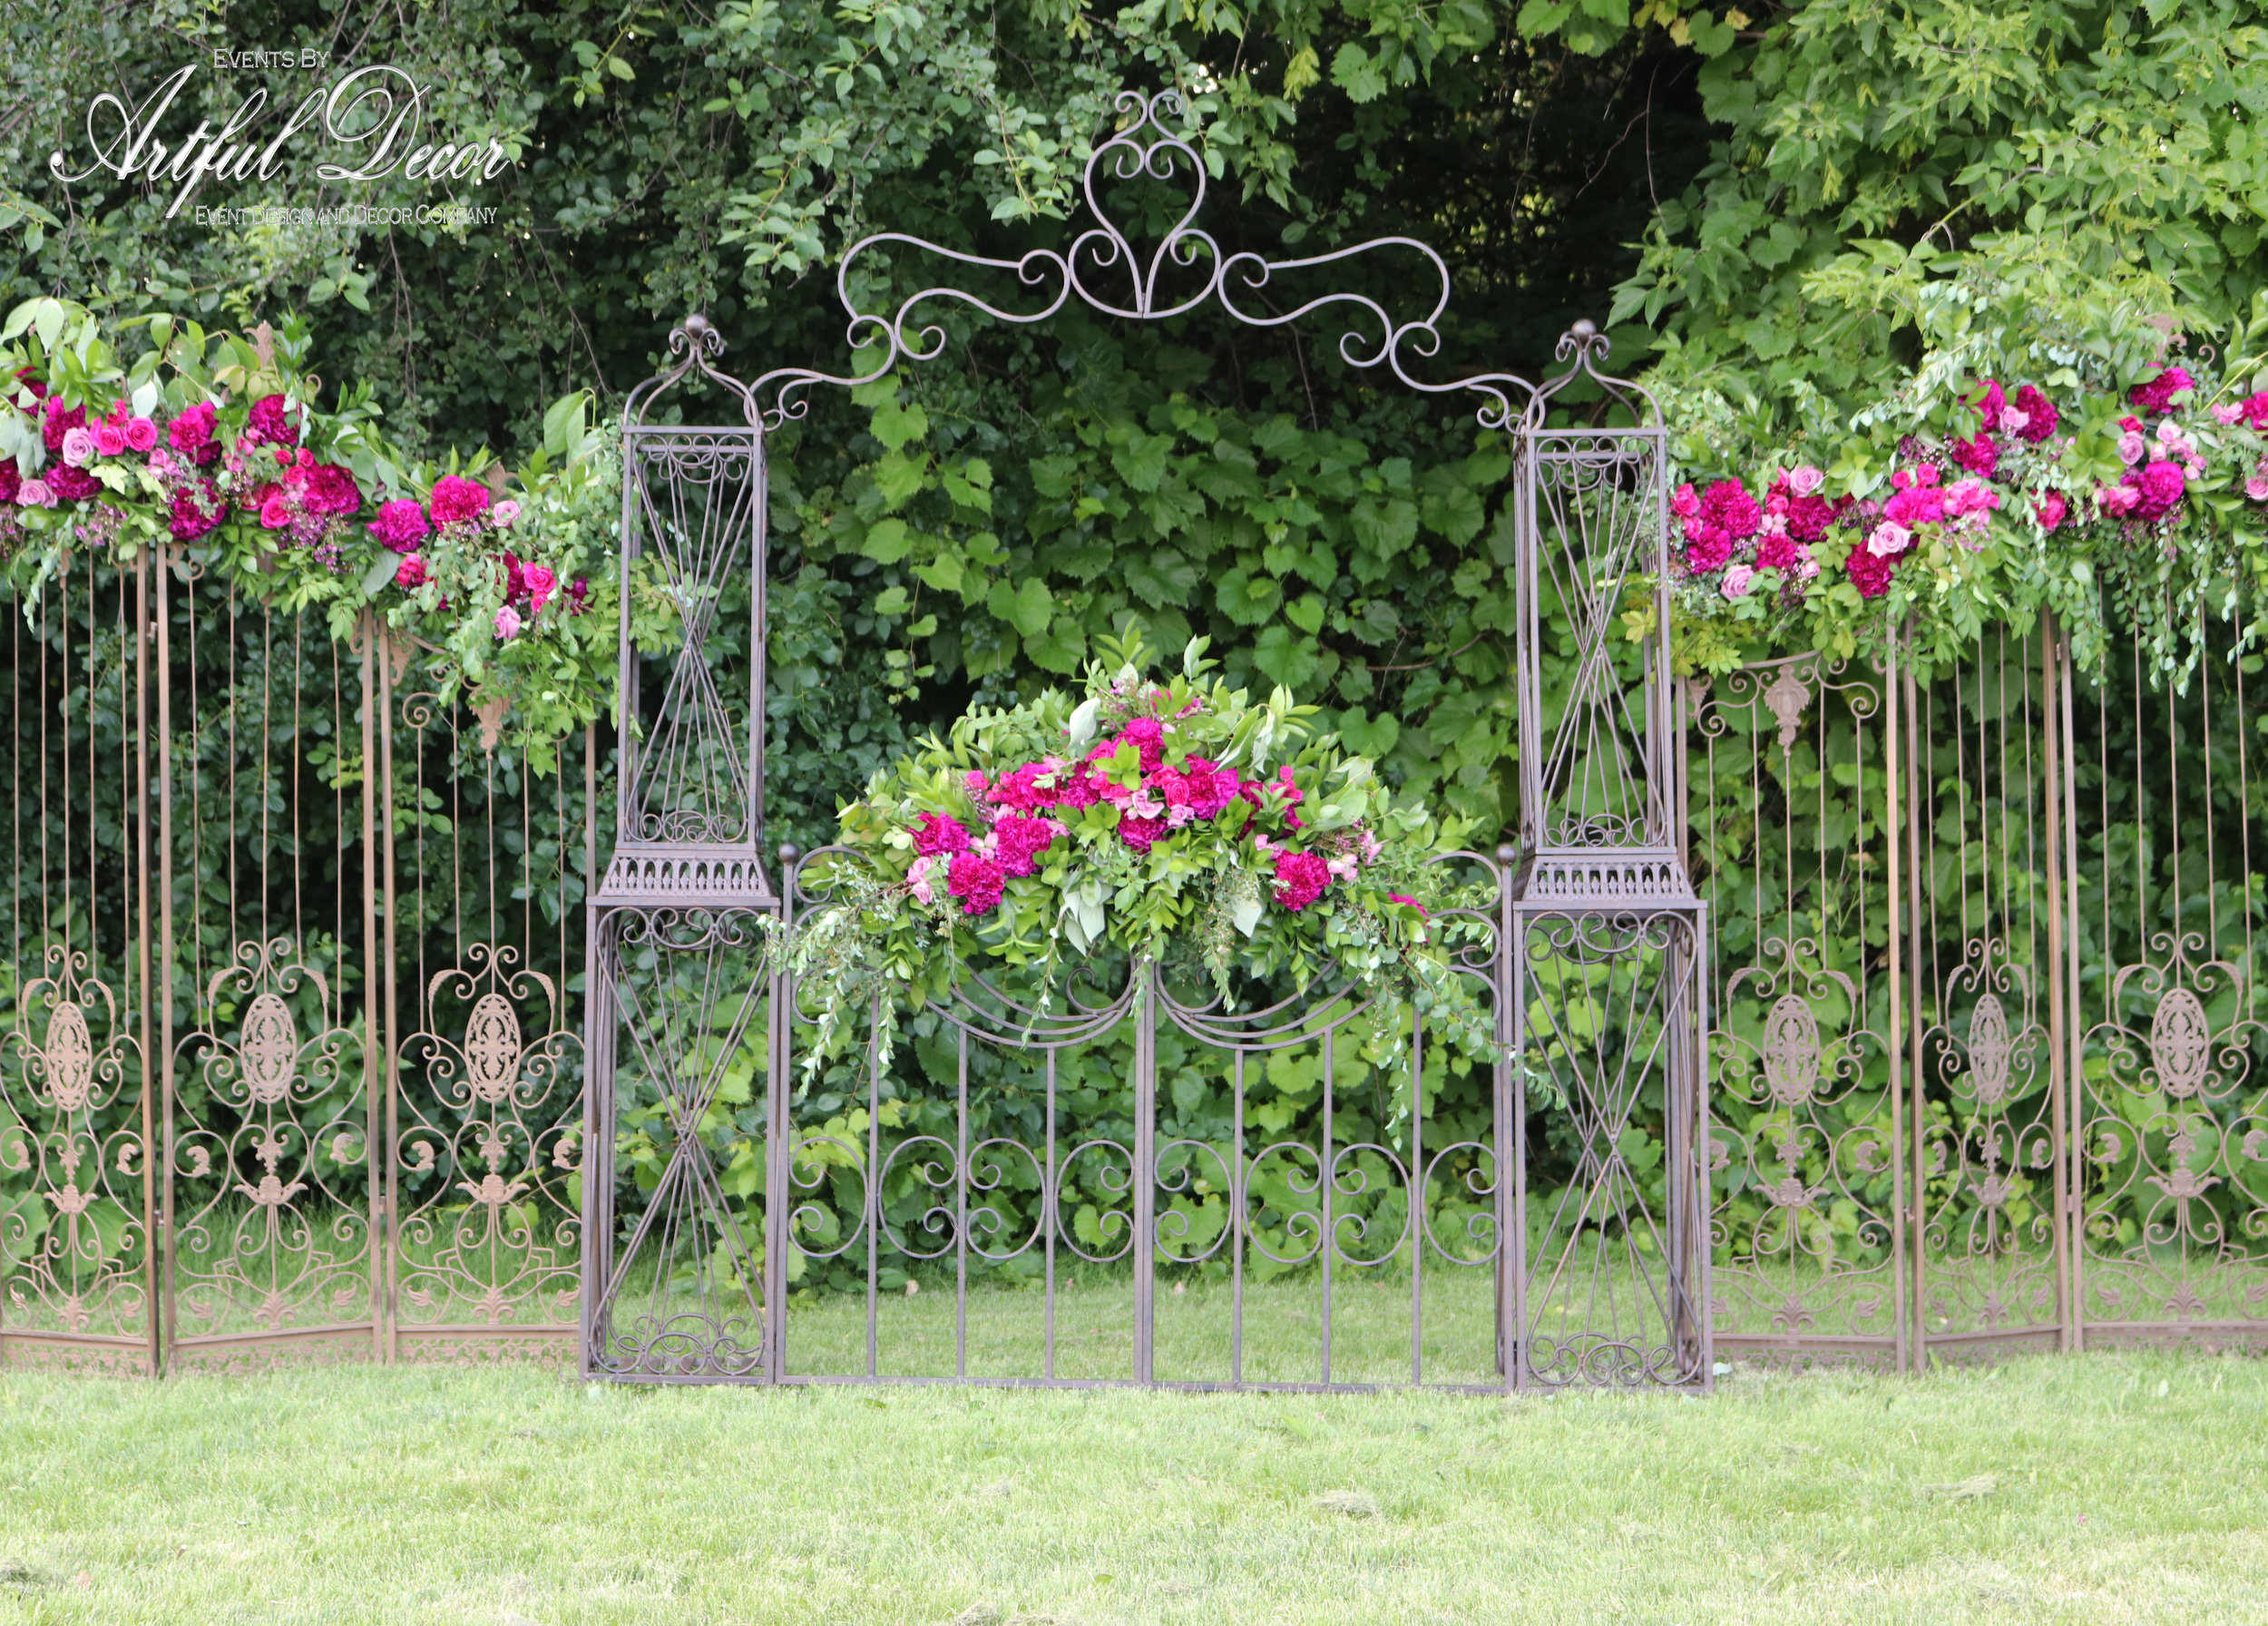 Garden Gate 12 Copyright.jpg